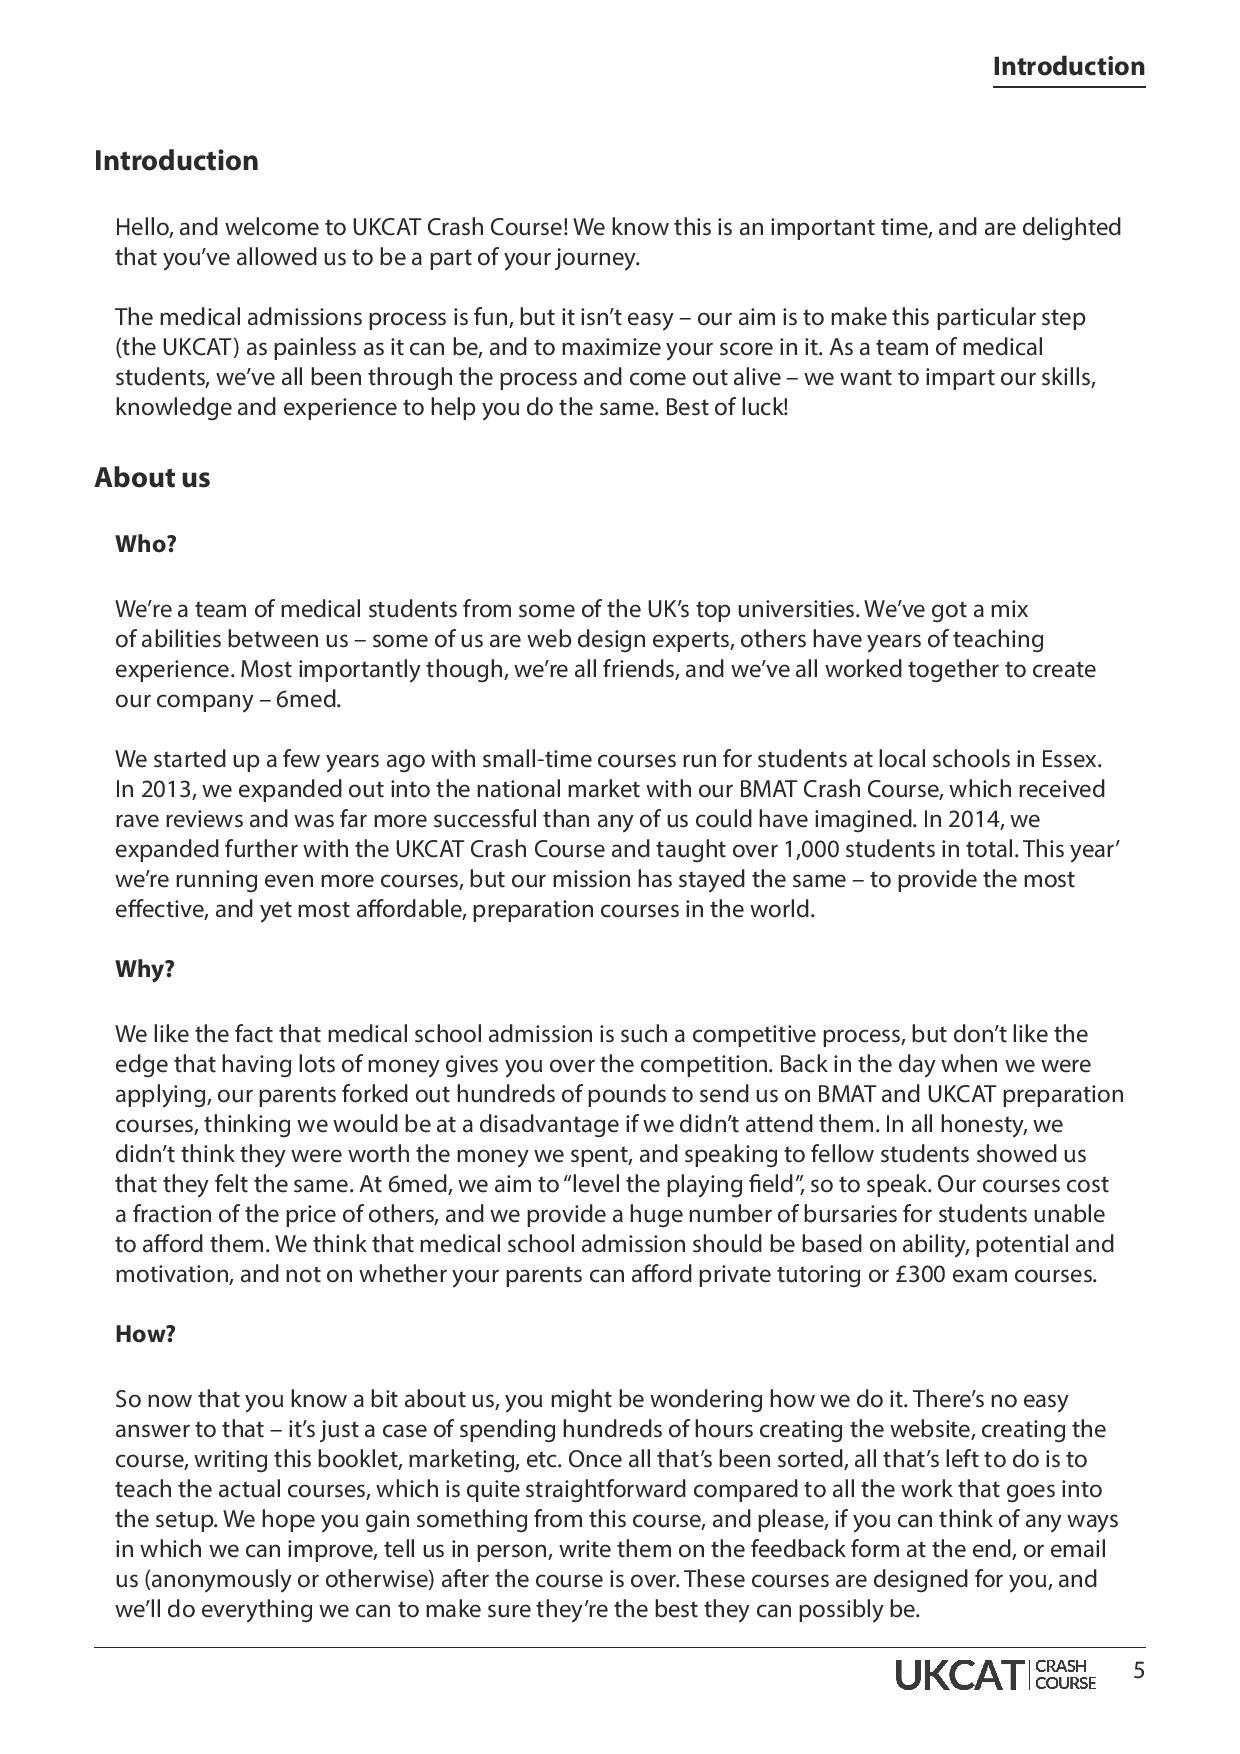 UKCAT Crash Course handbook page 4